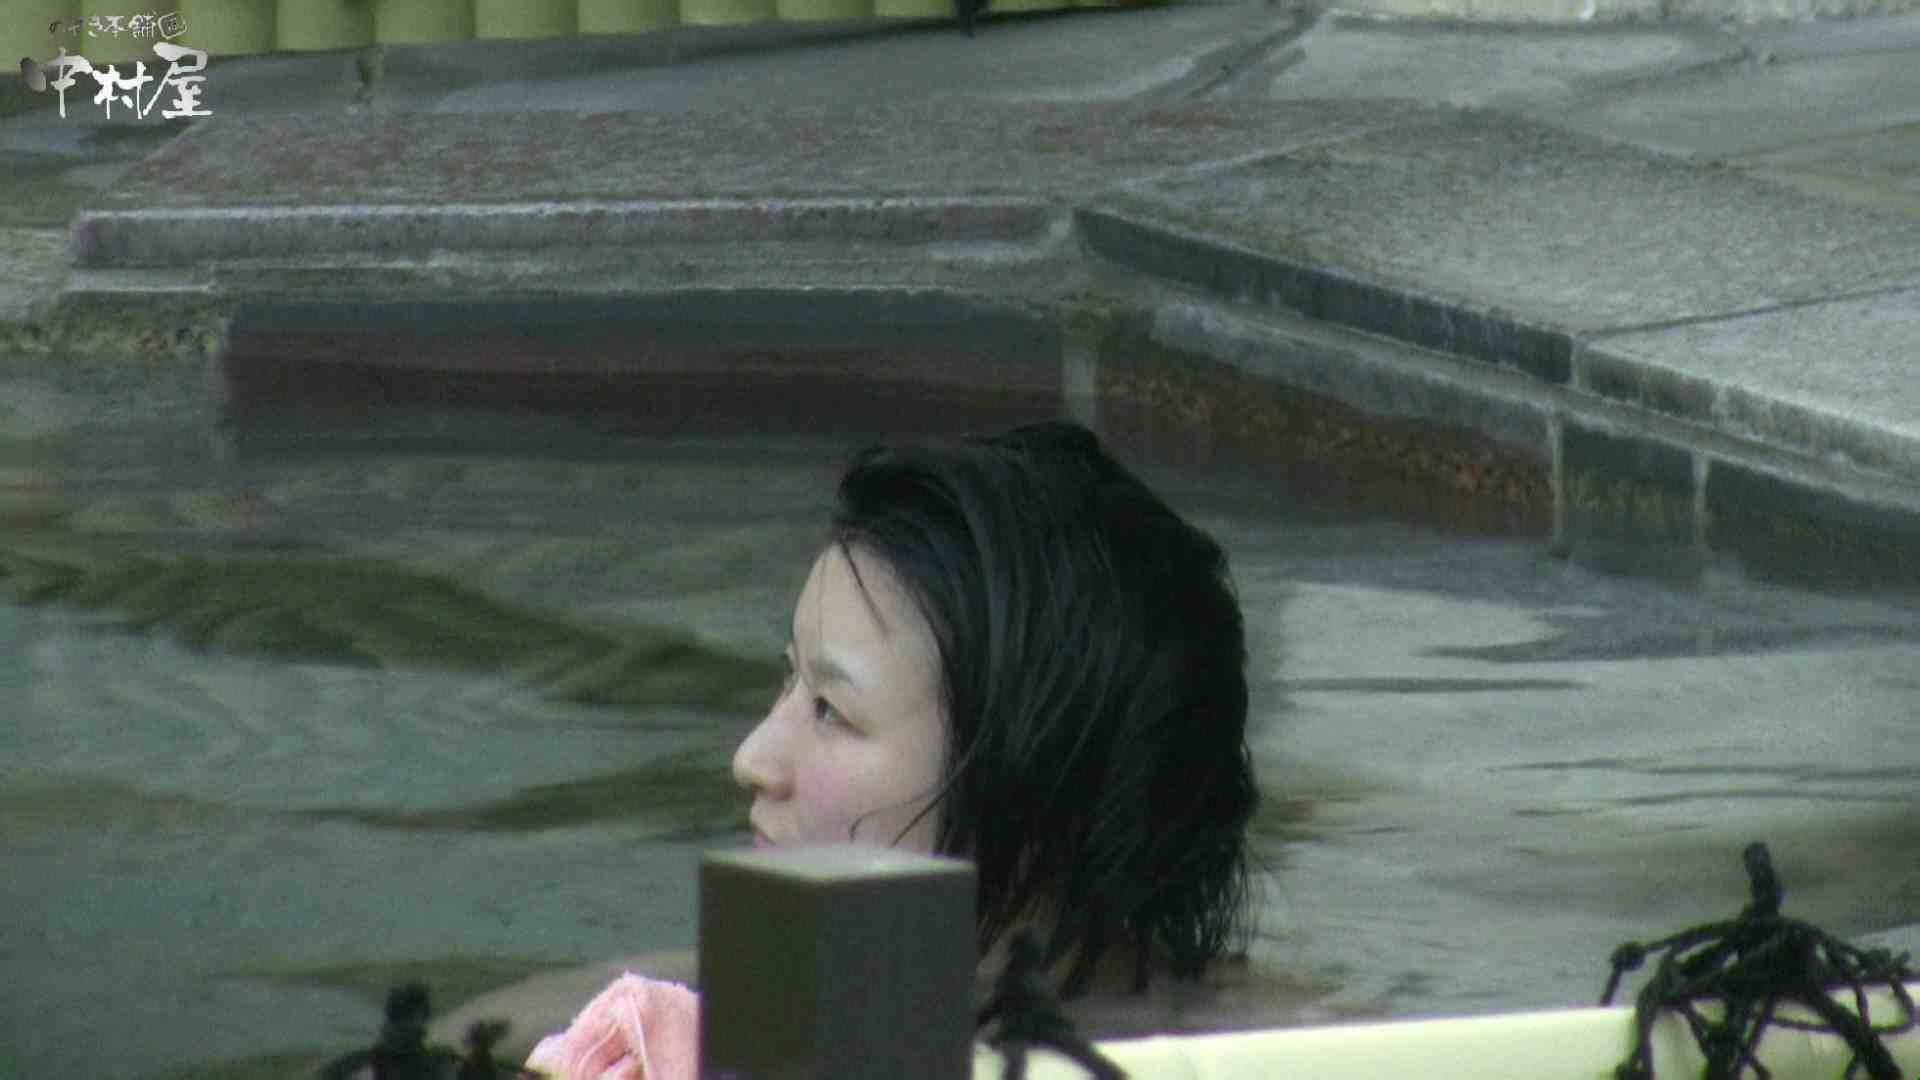 Aquaな露天風呂Vol.982 露天風呂編  78PIX 28